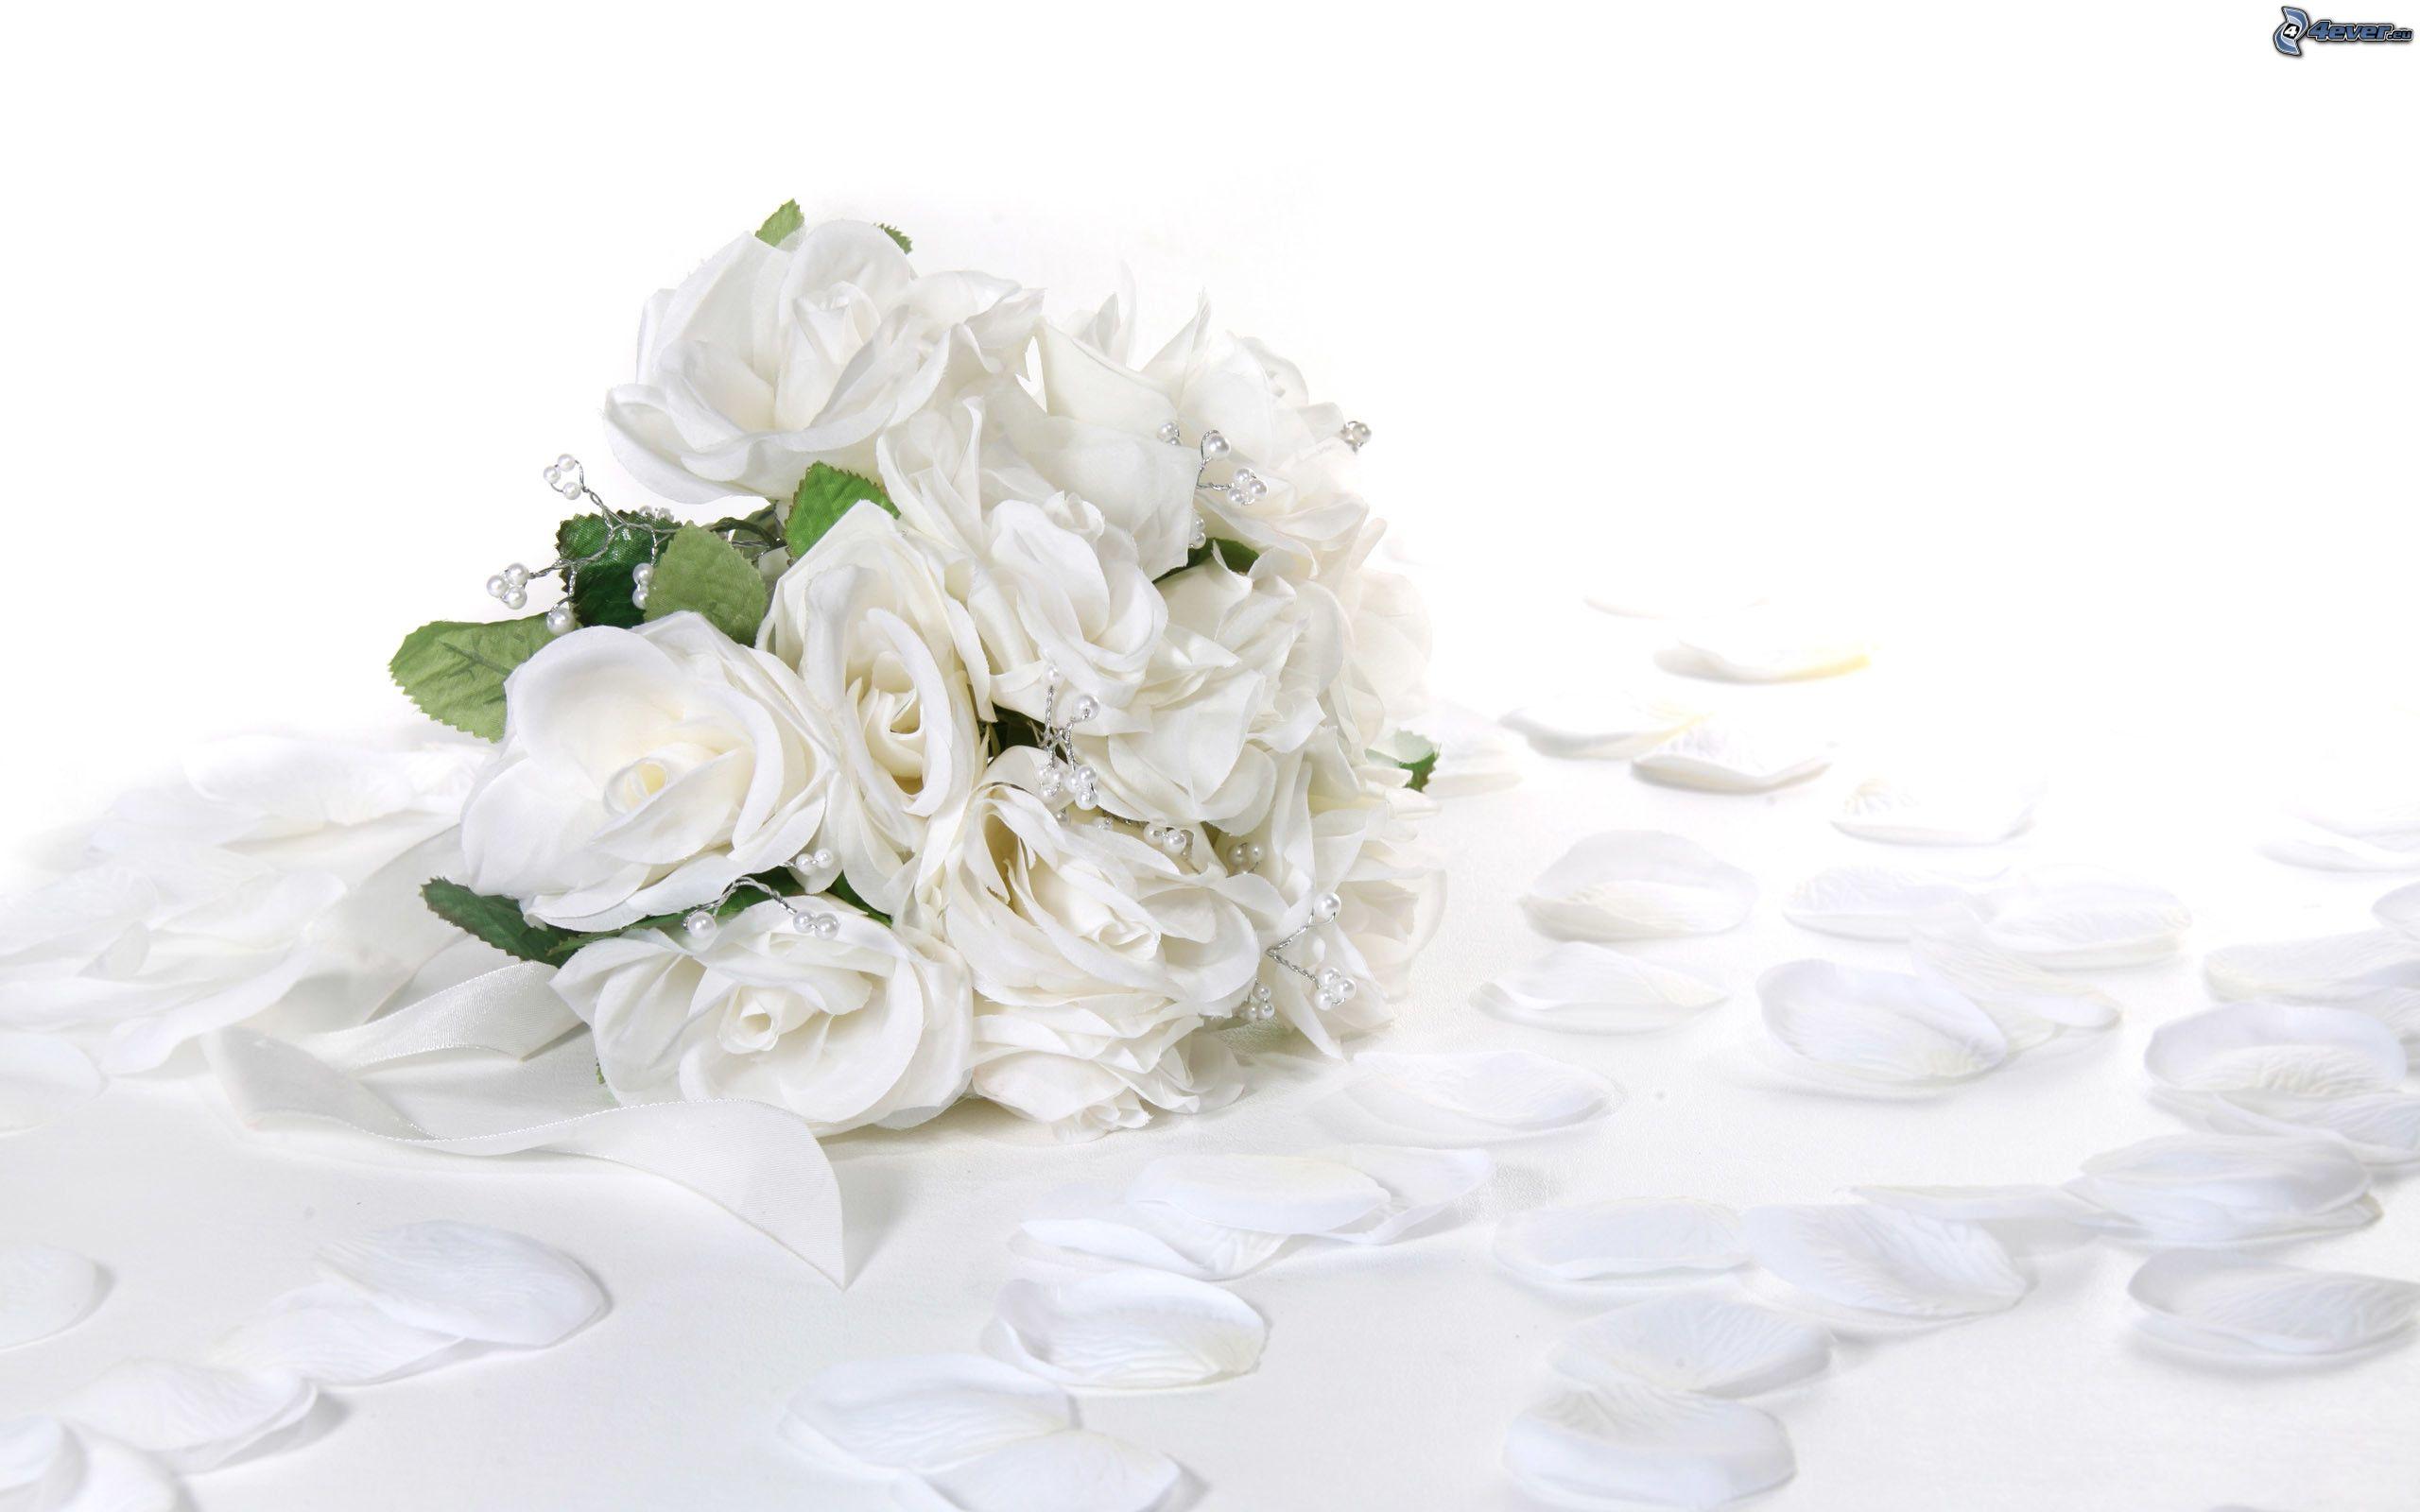 Rosas Blancas Wallpapers 66926 Interiordesign